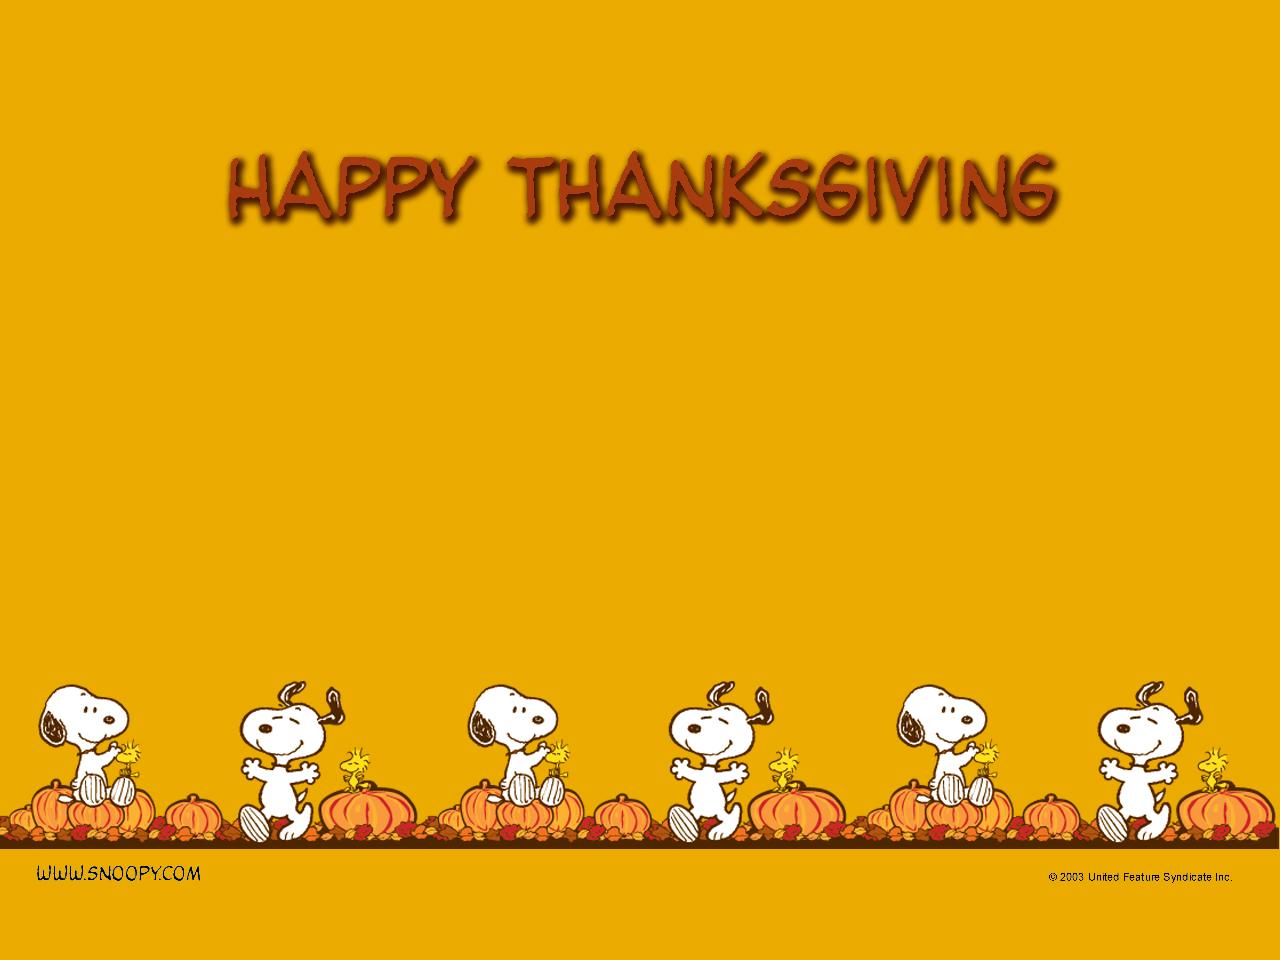 Peanuts Thanksgiving 1280x960